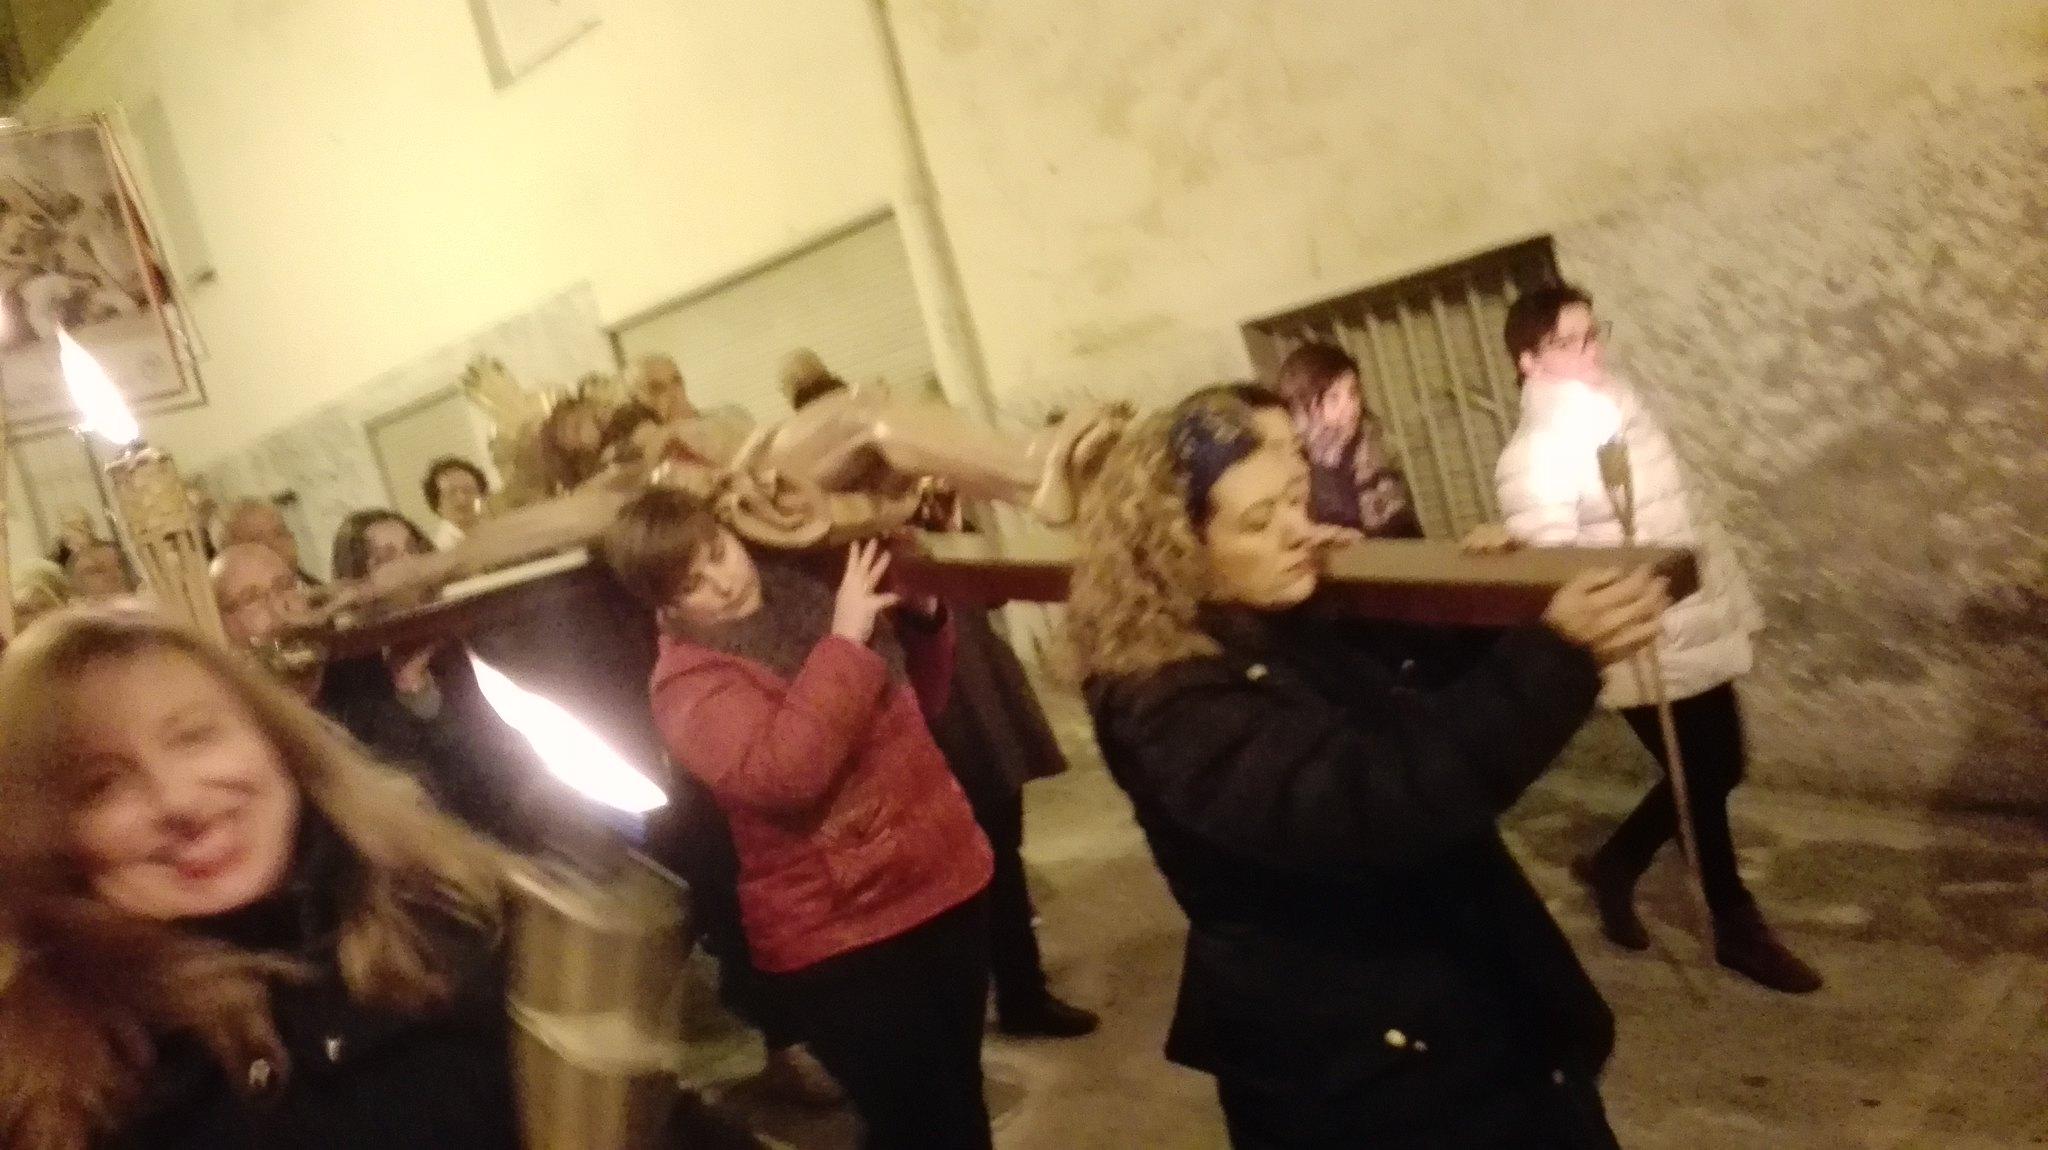 (2016-03-18) - VII Vía Crucis nocturno - Javier Romero Ripoll (093)